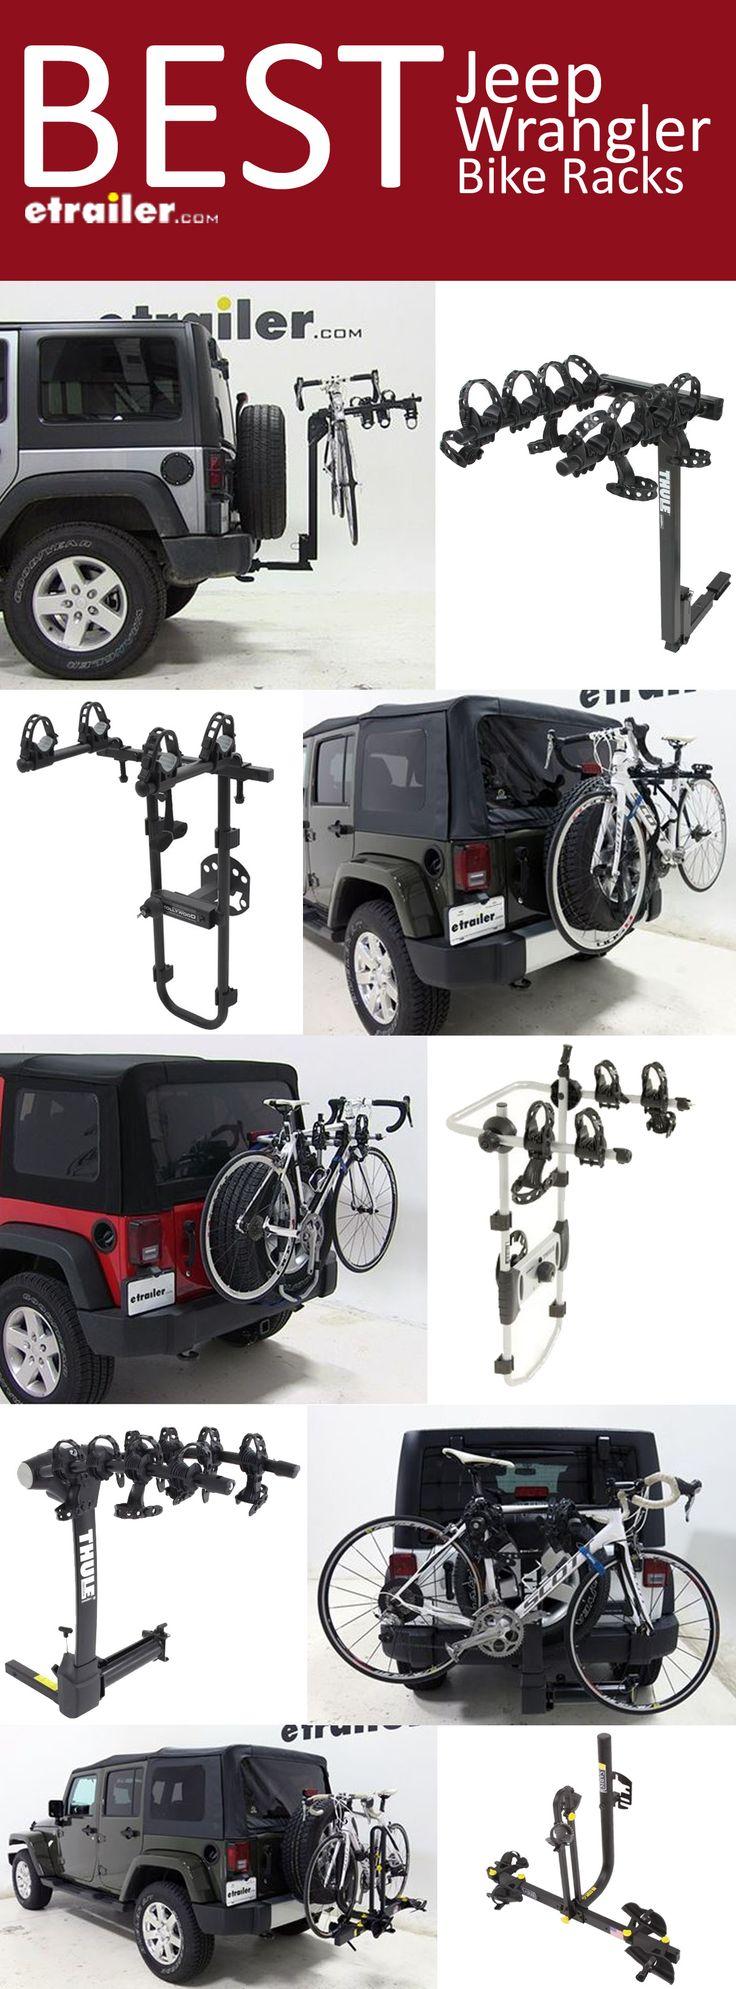 Here is the complete list of the Best Jeep Wrangler Bike Racks. Find the perfect fit bike rack to tilt, swing, fold, provide anti-sway, 2-bike carrier, 3-bike carrier, 4-bike carrier, platform bike rack, spare tire mount bike rack and hitch mounted bike rack.